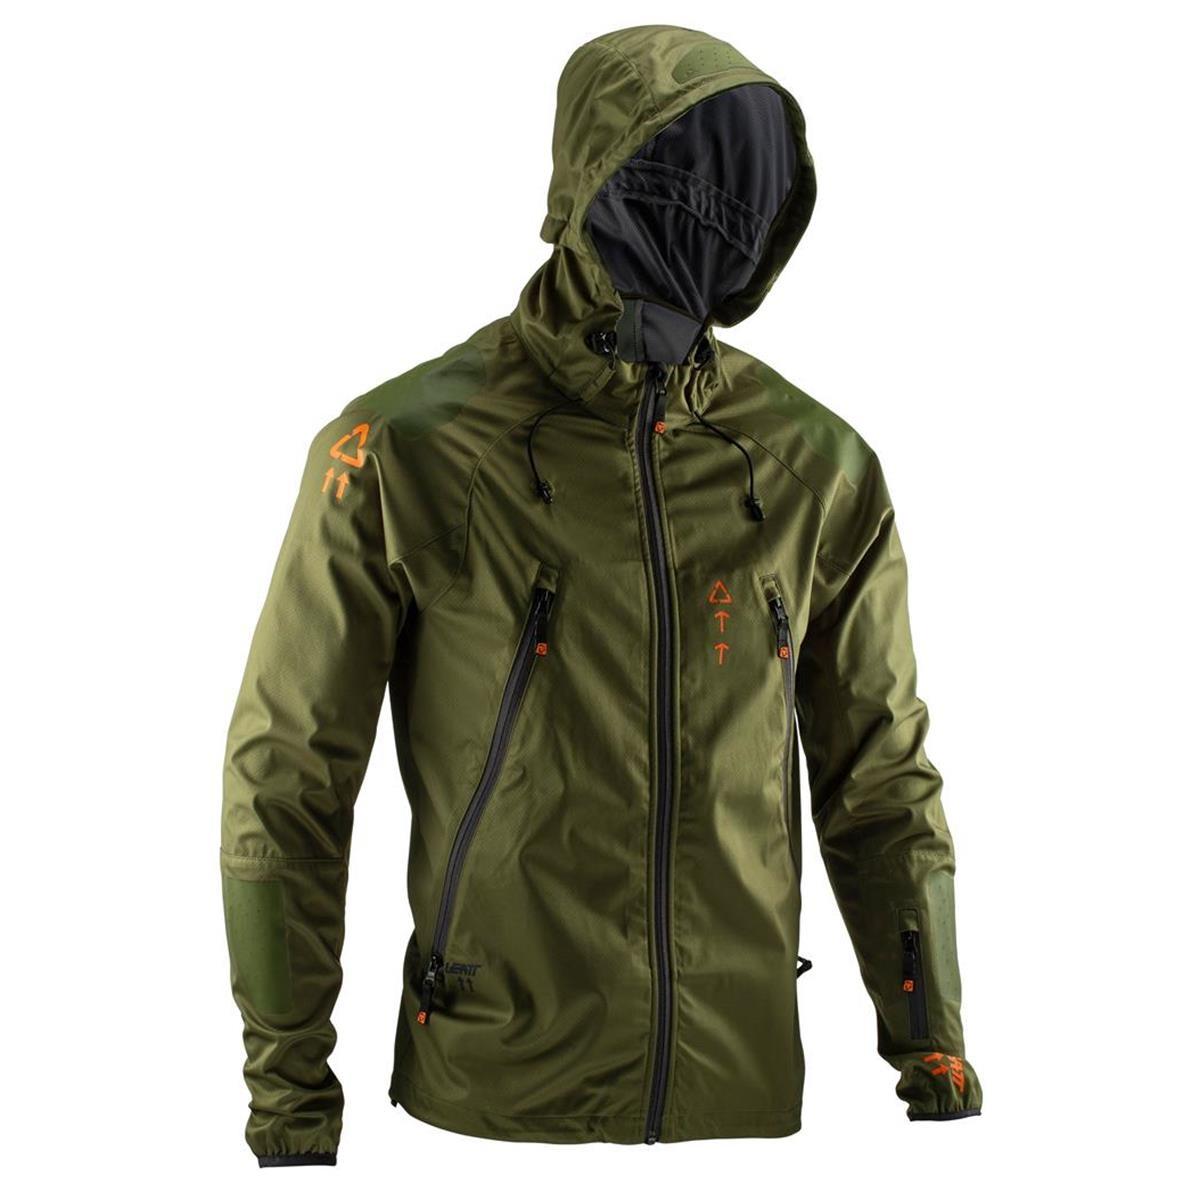 Leatt DBX 4.0 Jacket-1